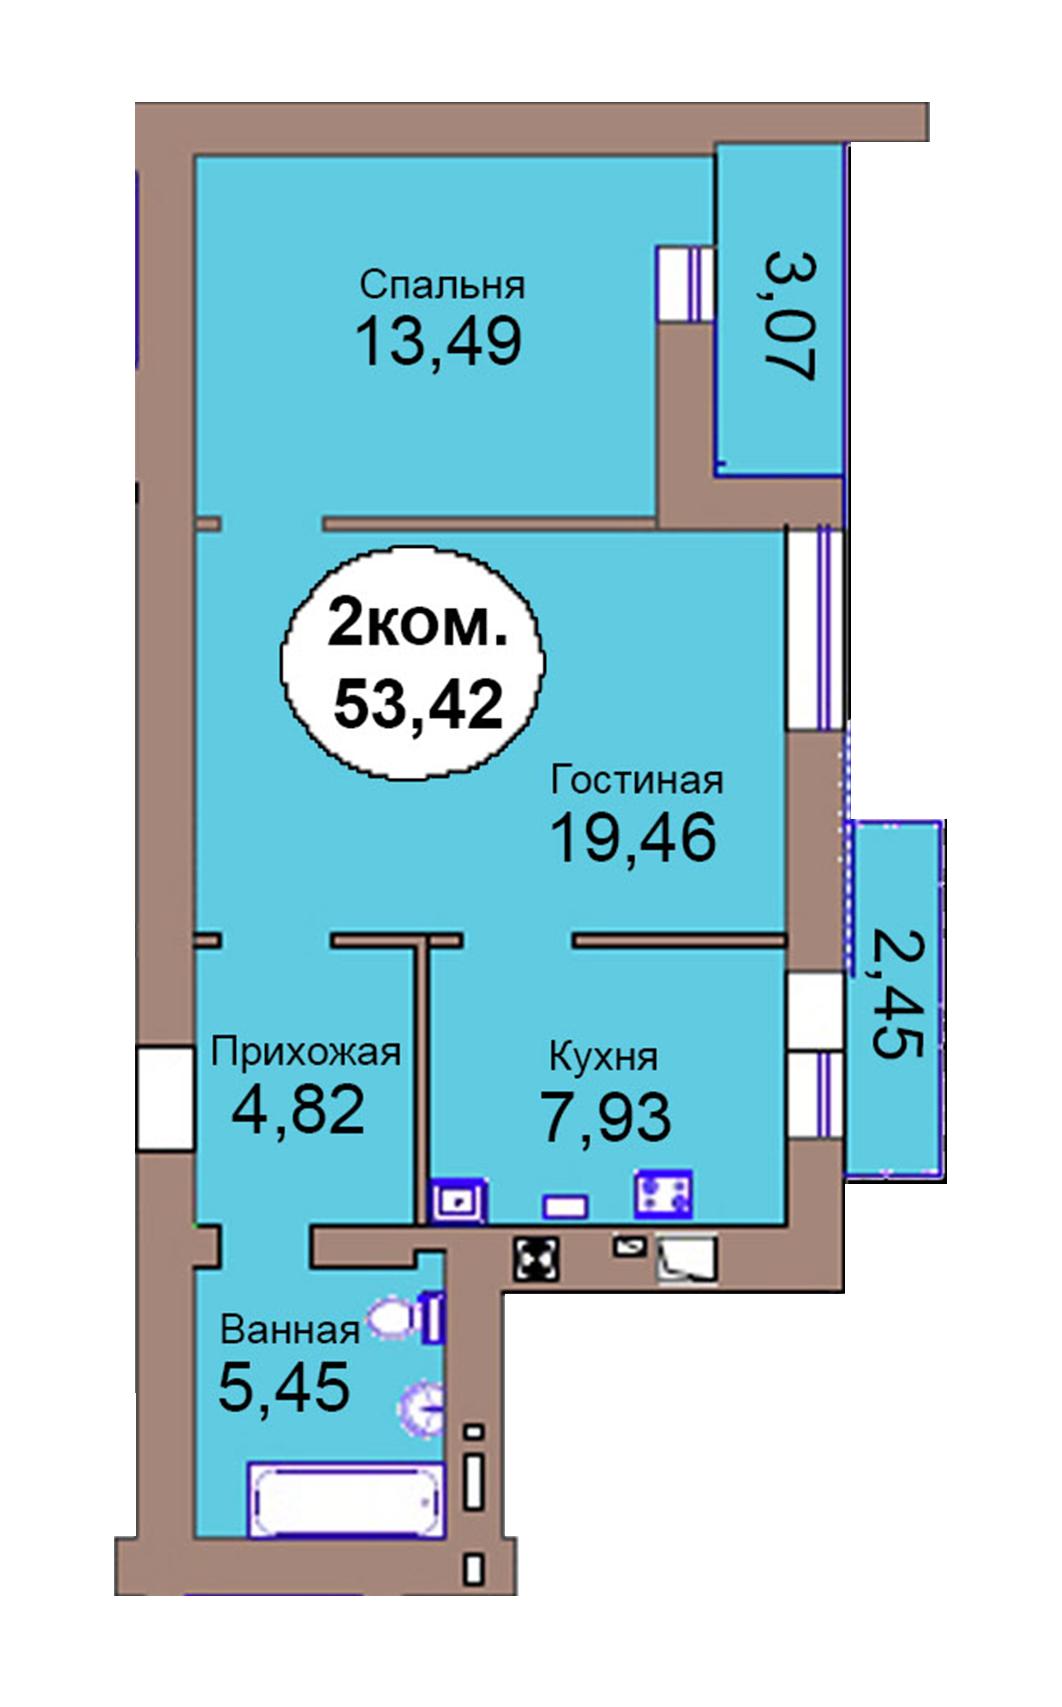 2-комн. кв. по пер. Калининградский, 4  кв. 90 в Калининграде